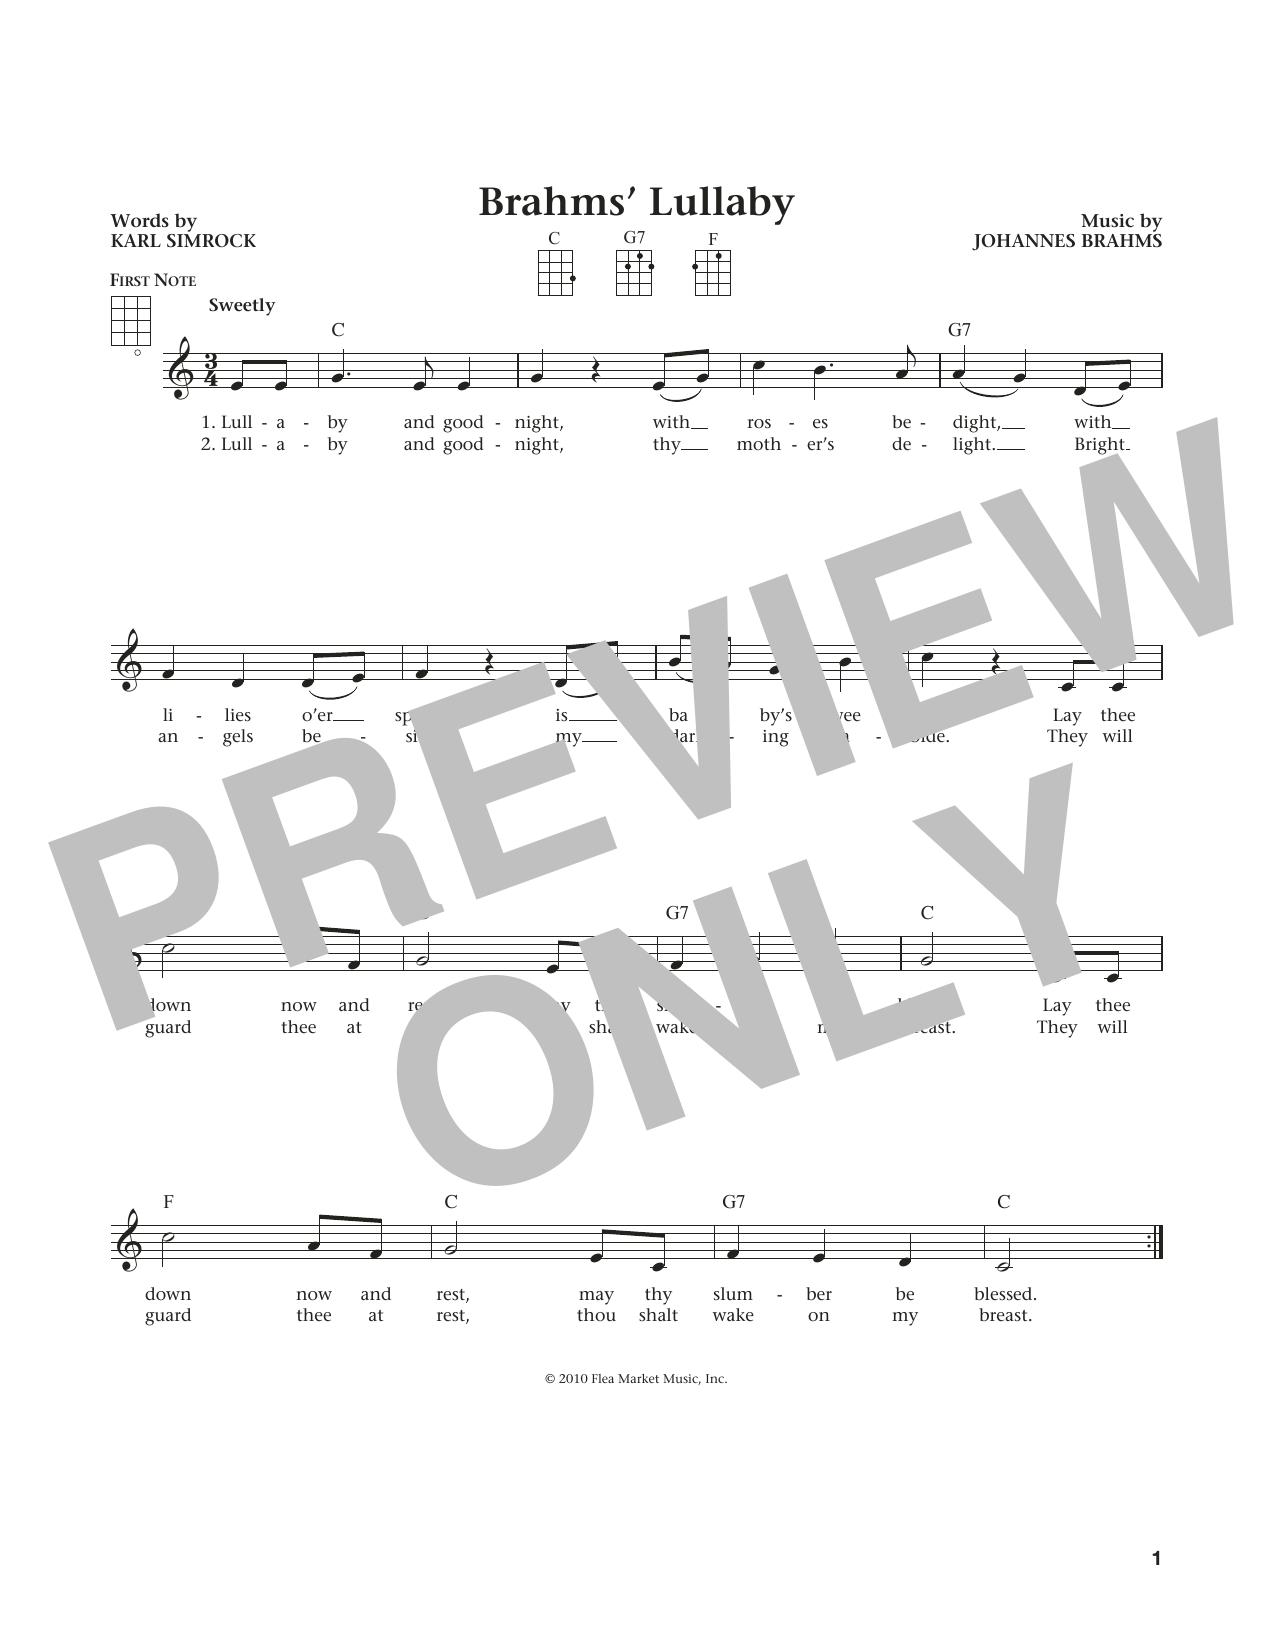 Johannes Brahms Lullaby Cradle Song From The Daily Ukulele Arr Liz And Jim Beloff Sheet Music Pdf Notes Chords Children Score Ukulele Download Printable Sku 184433